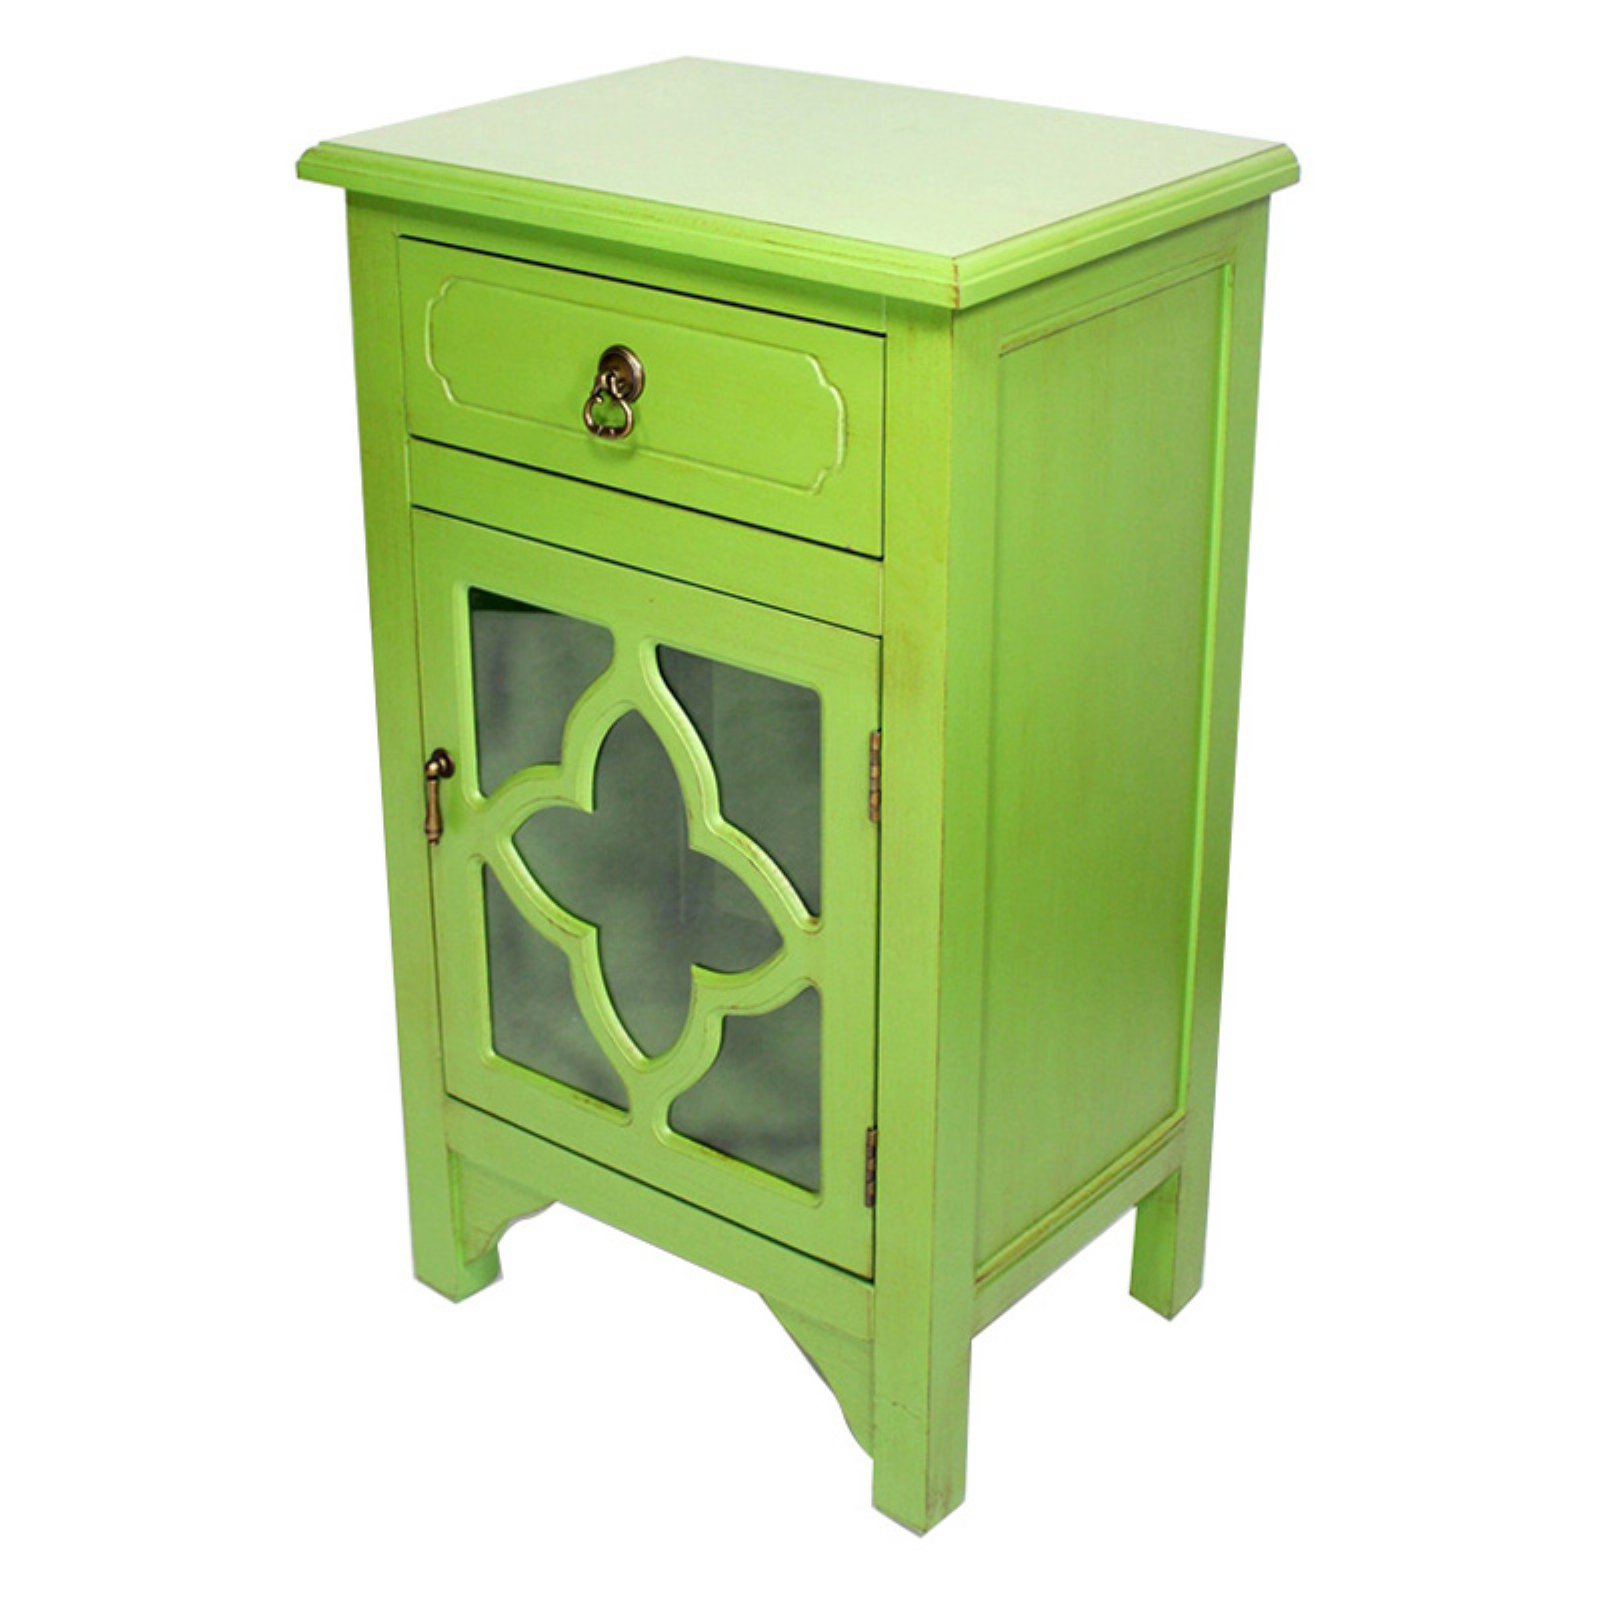 Heather Ann Creations Frasera 1 Drawer 1 Door Quatrefoil Glass Accent Cabinet